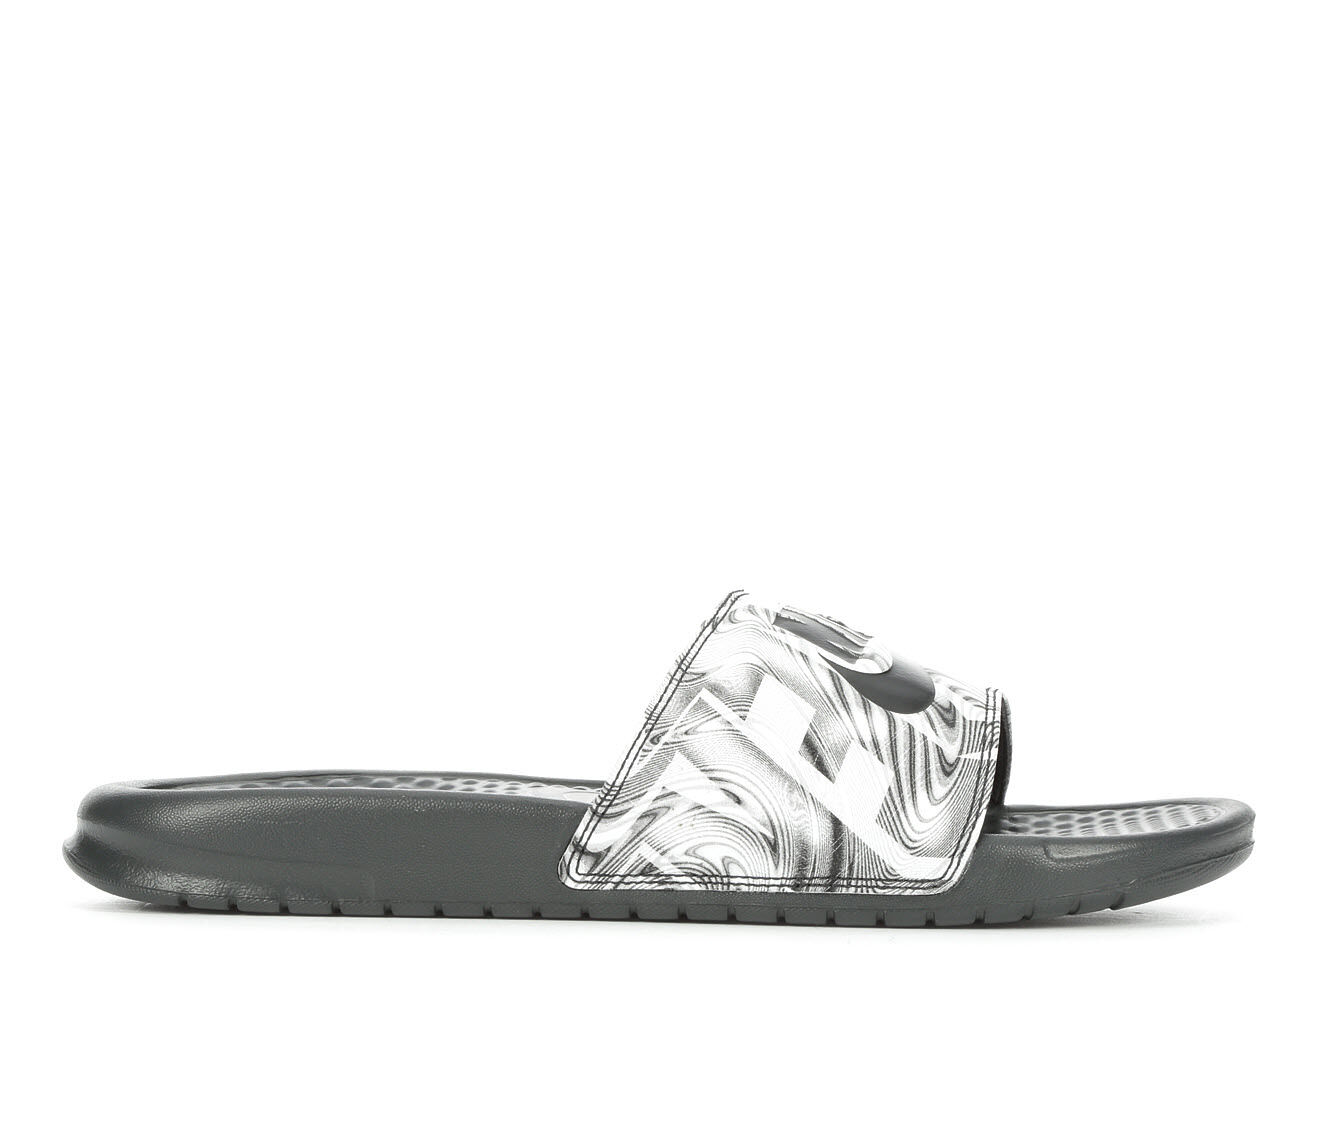 buyt new Men's Nike Benassi JDI Print Sport Slides Anthracite/Bk